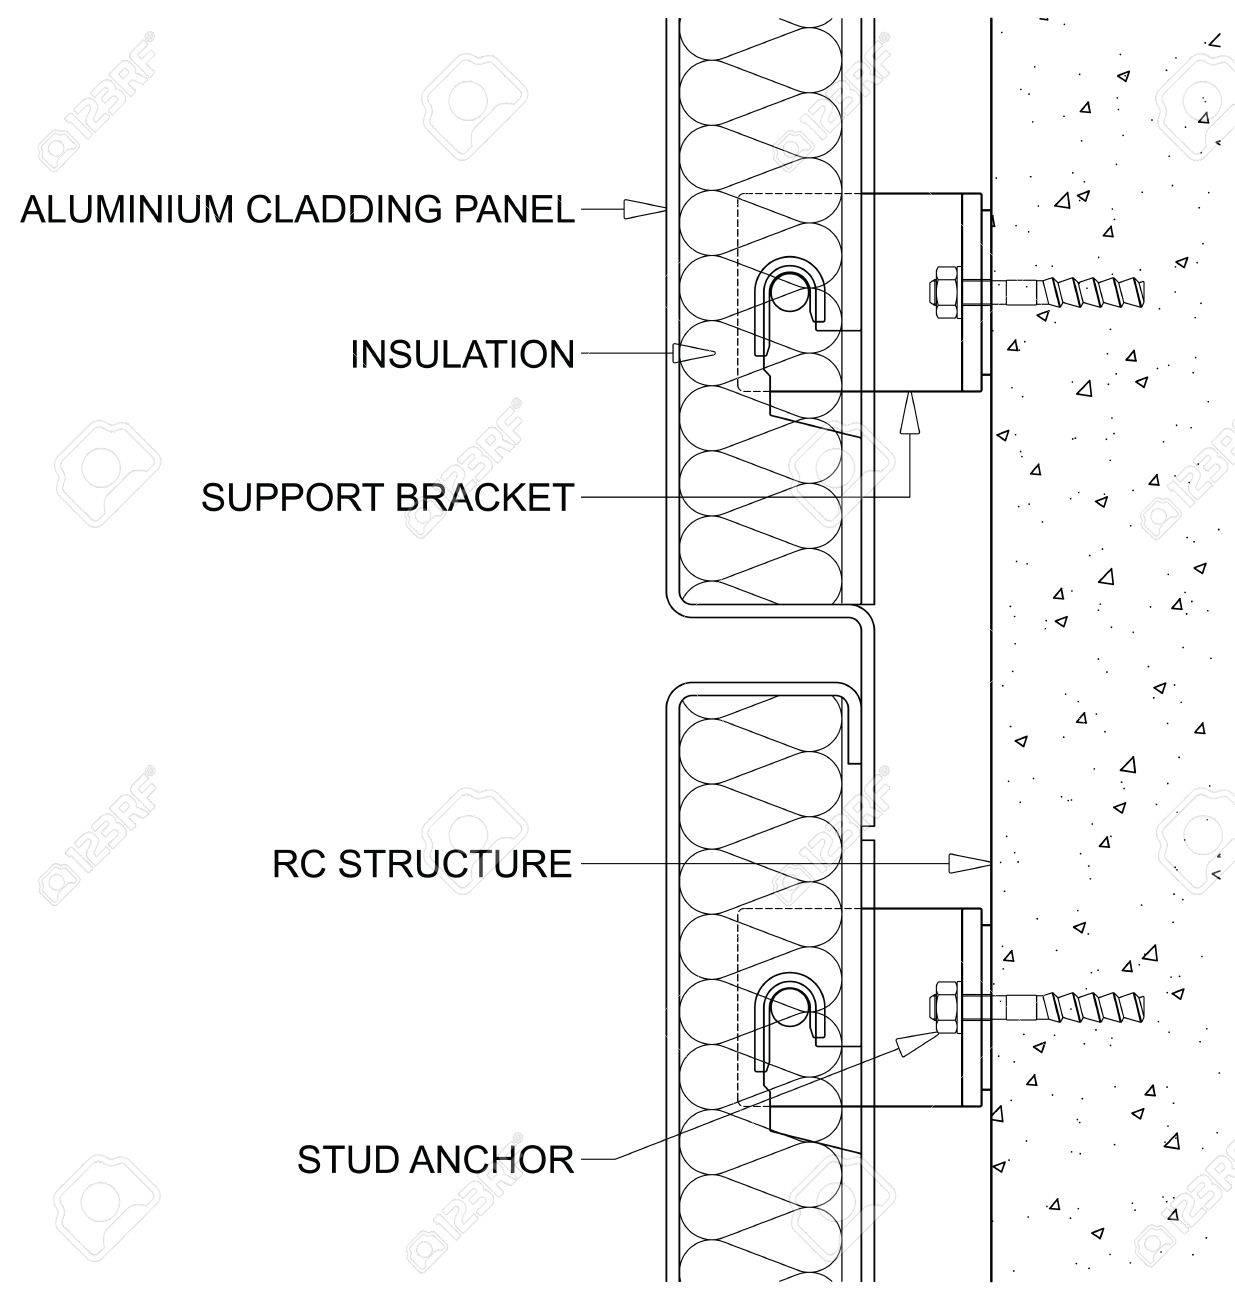 generic line diagram of a cross section through rainscreen aluminium..  royalty free cliparts, vectors, and stock illustration. image 84406690.  123rf.com